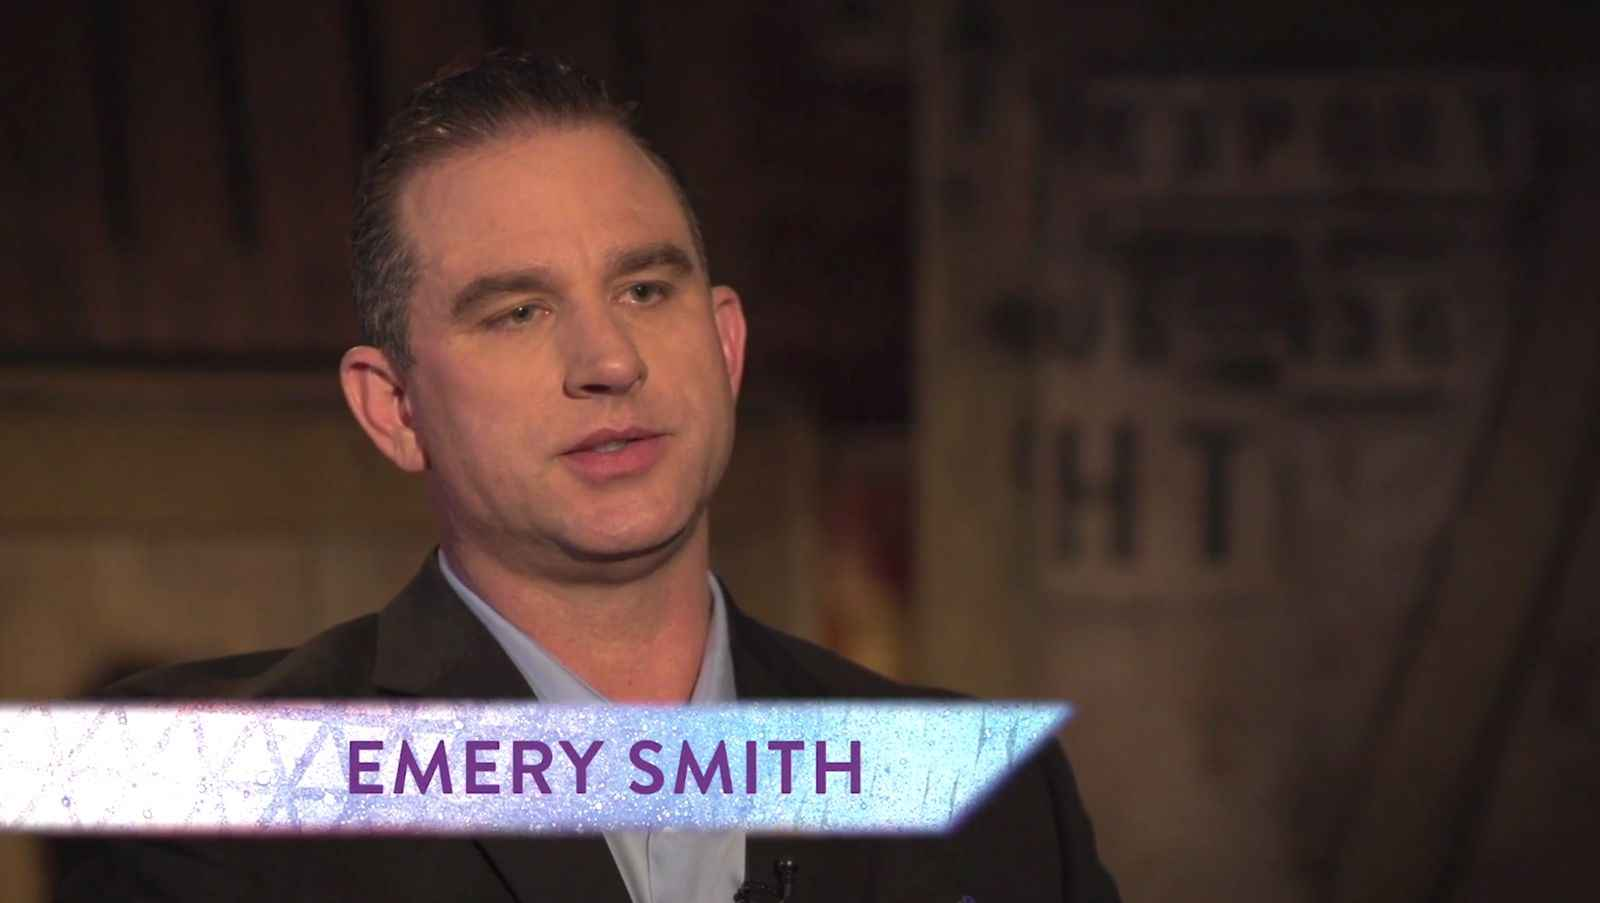 1 Emery Smith 4